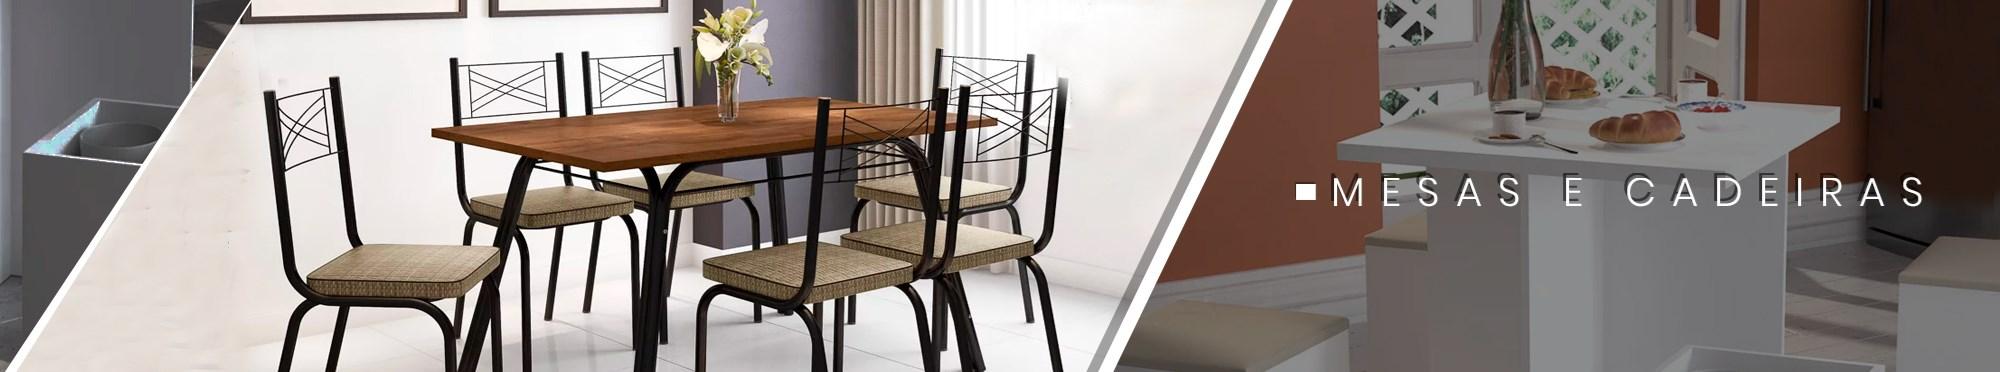 Mesas e Cadeiras - Mpozenato